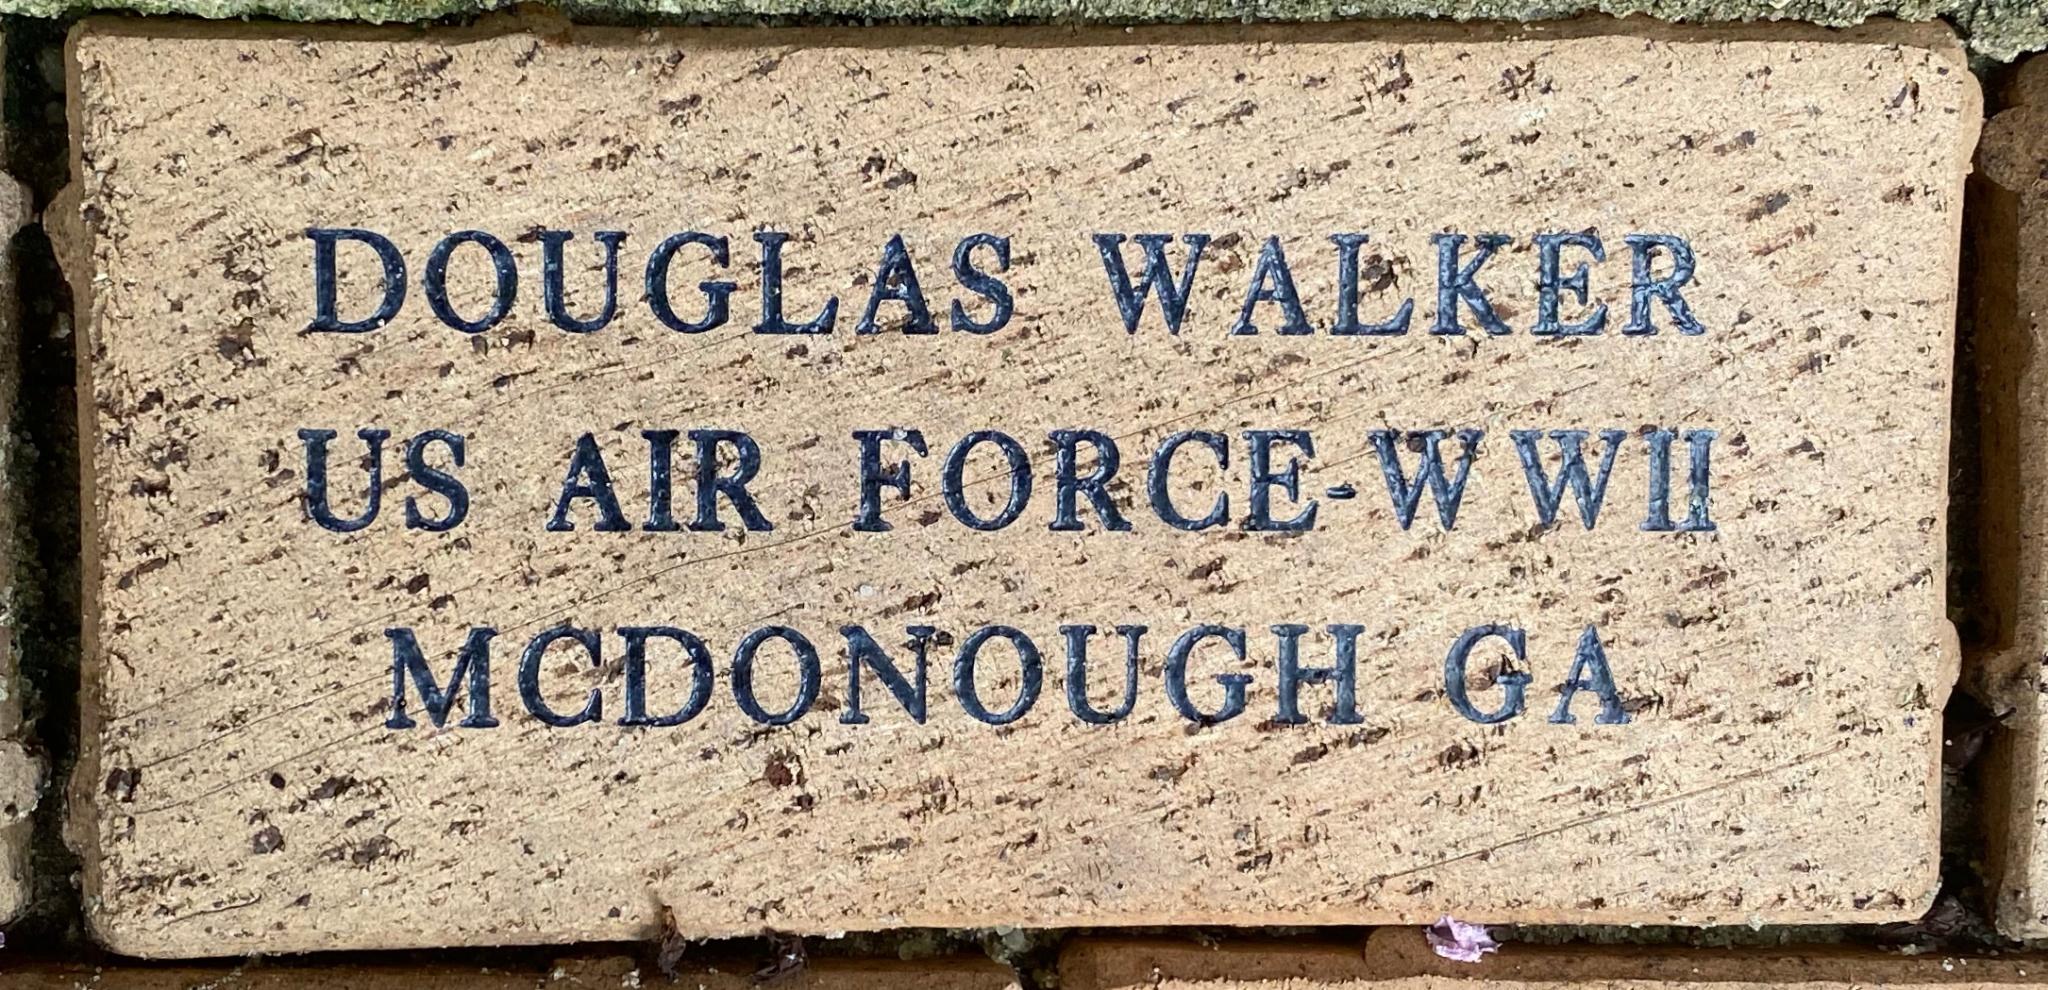 DOUGLAS WALKER US AIR FORCE – WWII MCDONOUGH GA